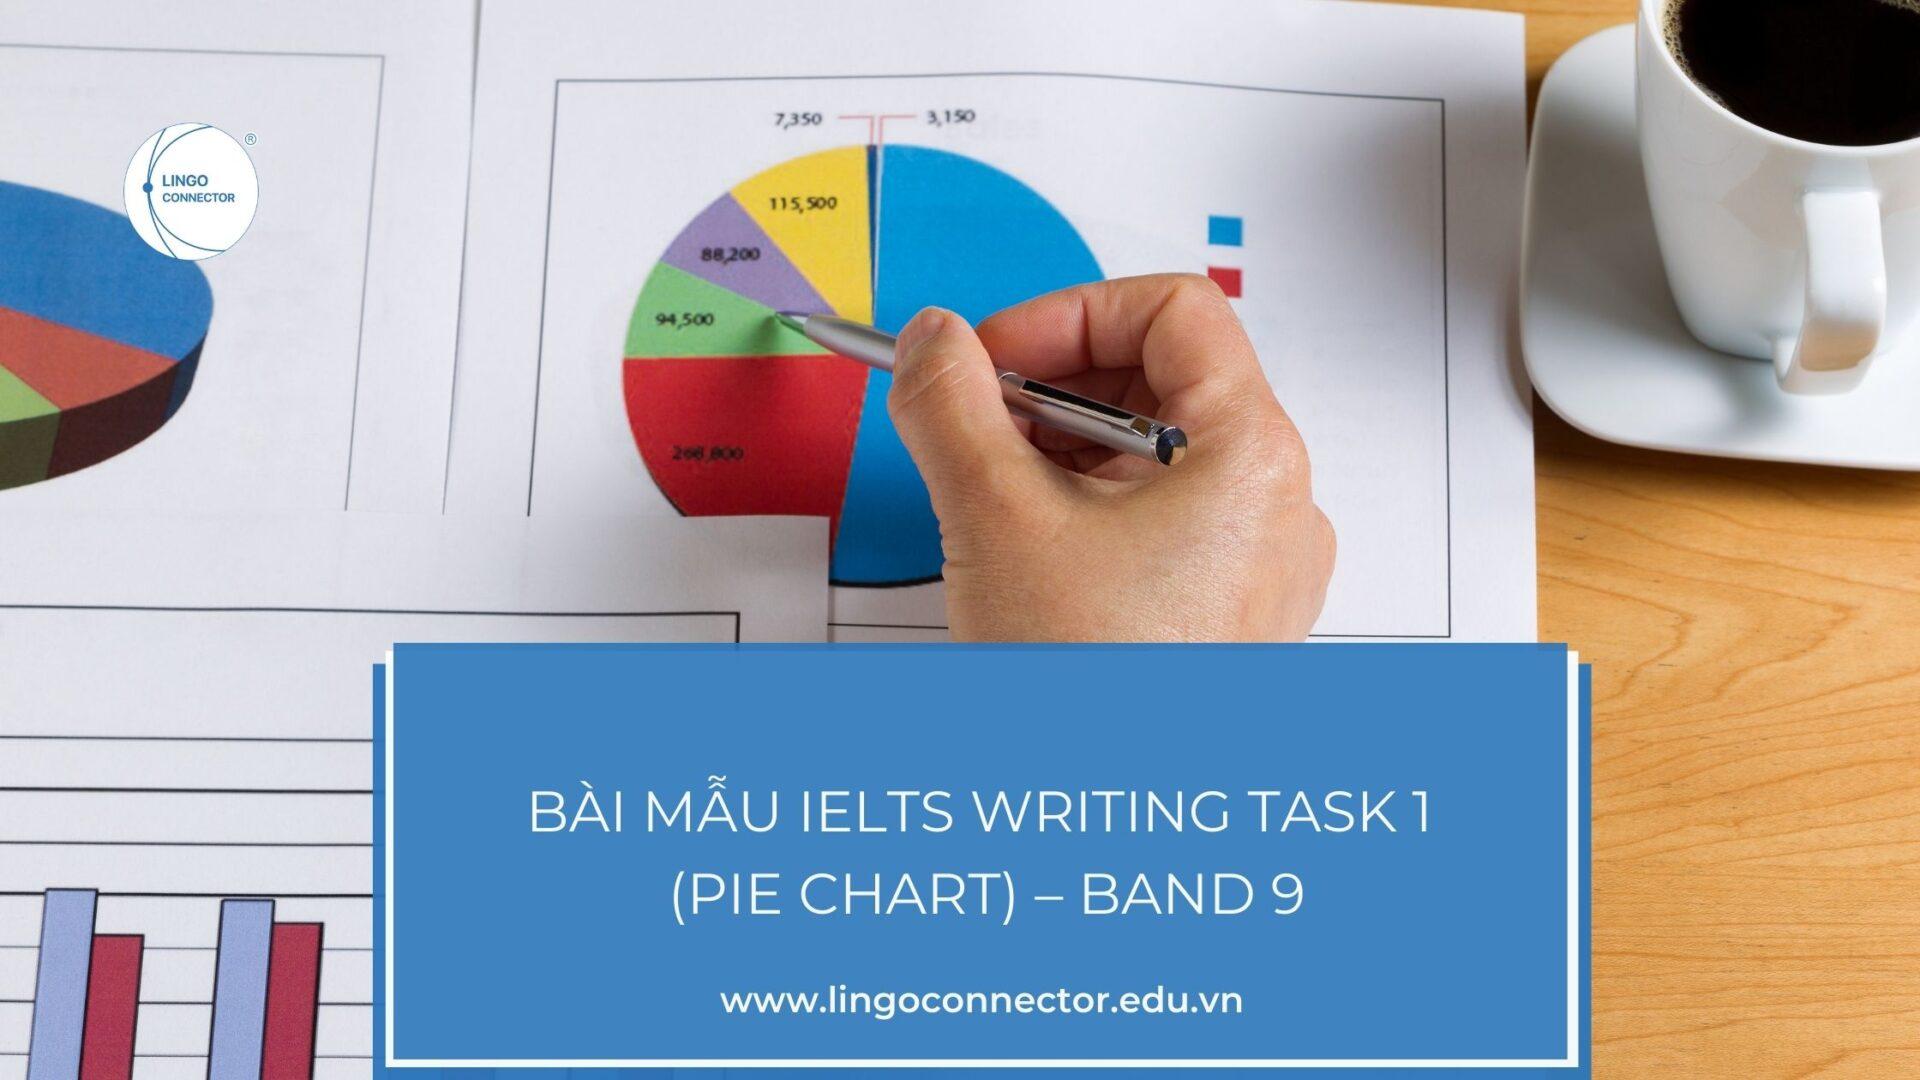 Bài mẫu IELTS Writing Task 1 (Pie chart) – Band 9